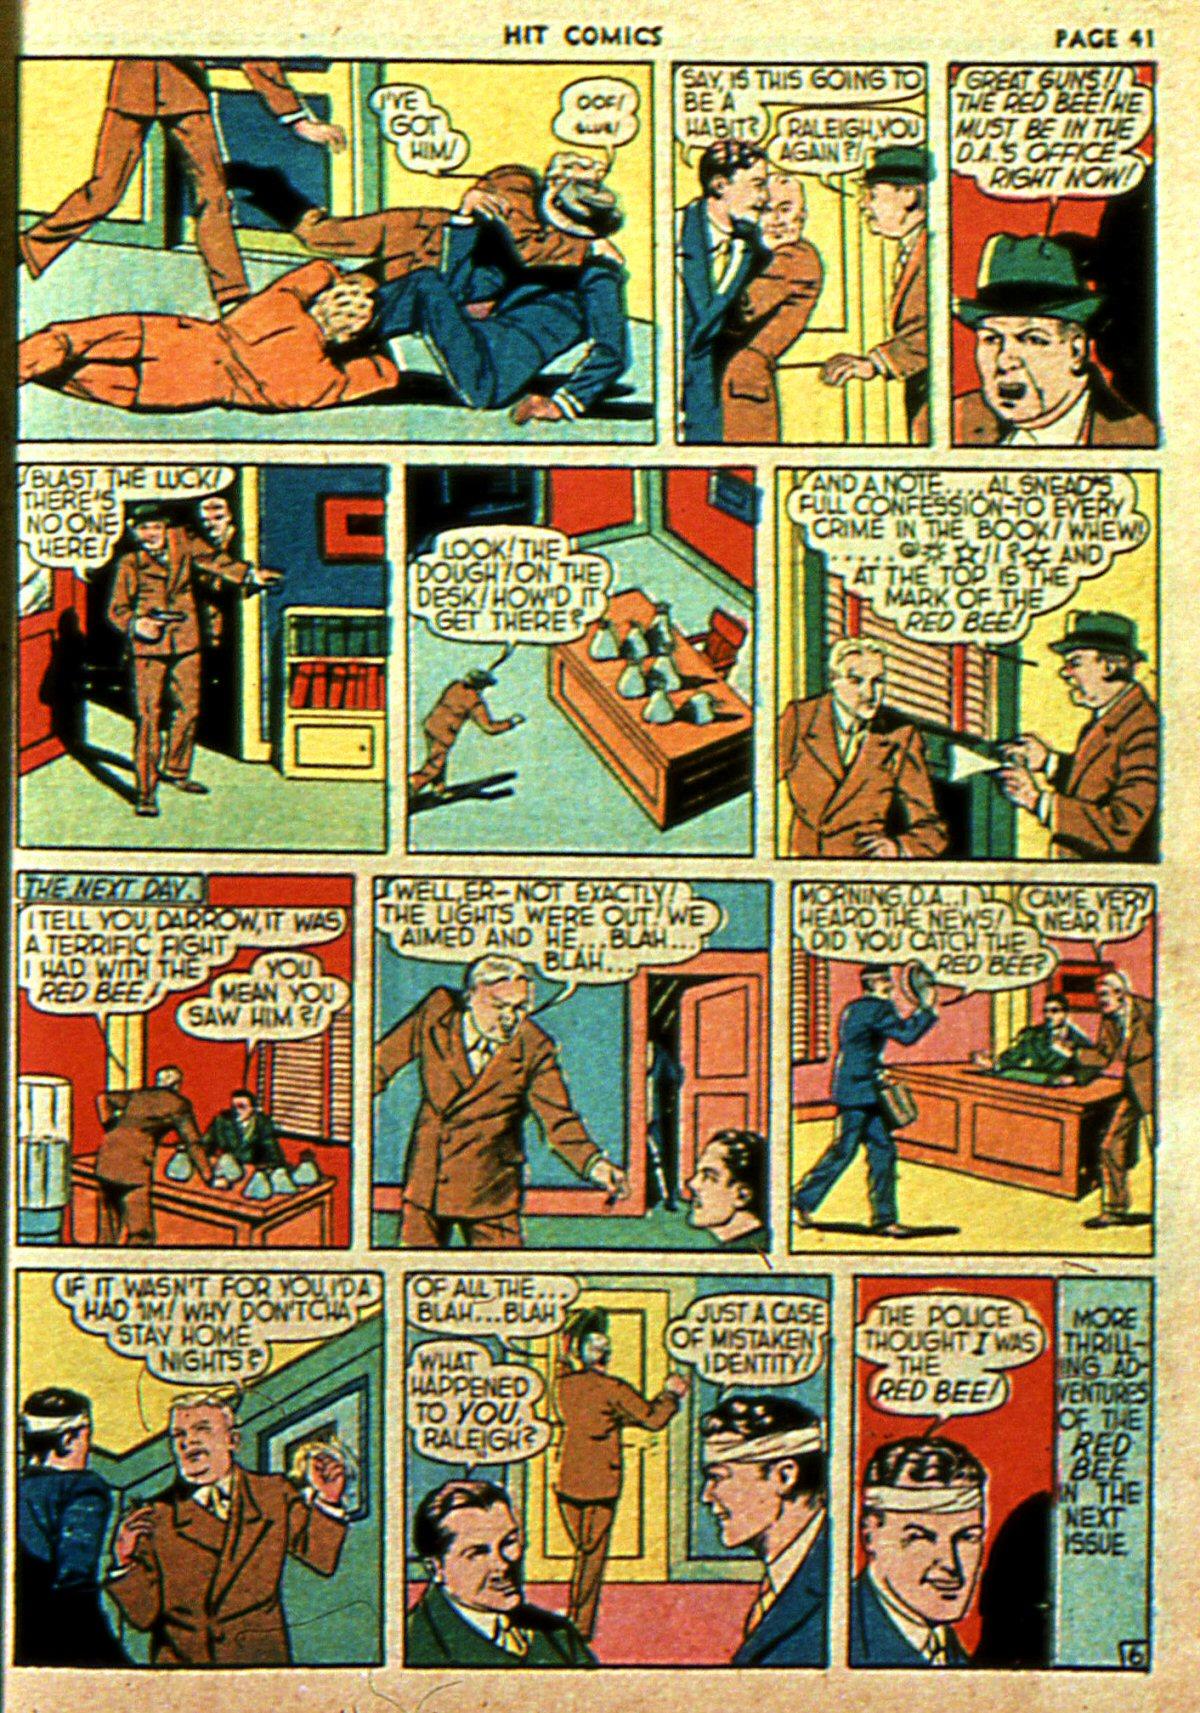 Read online Hit Comics comic -  Issue #2 - 43